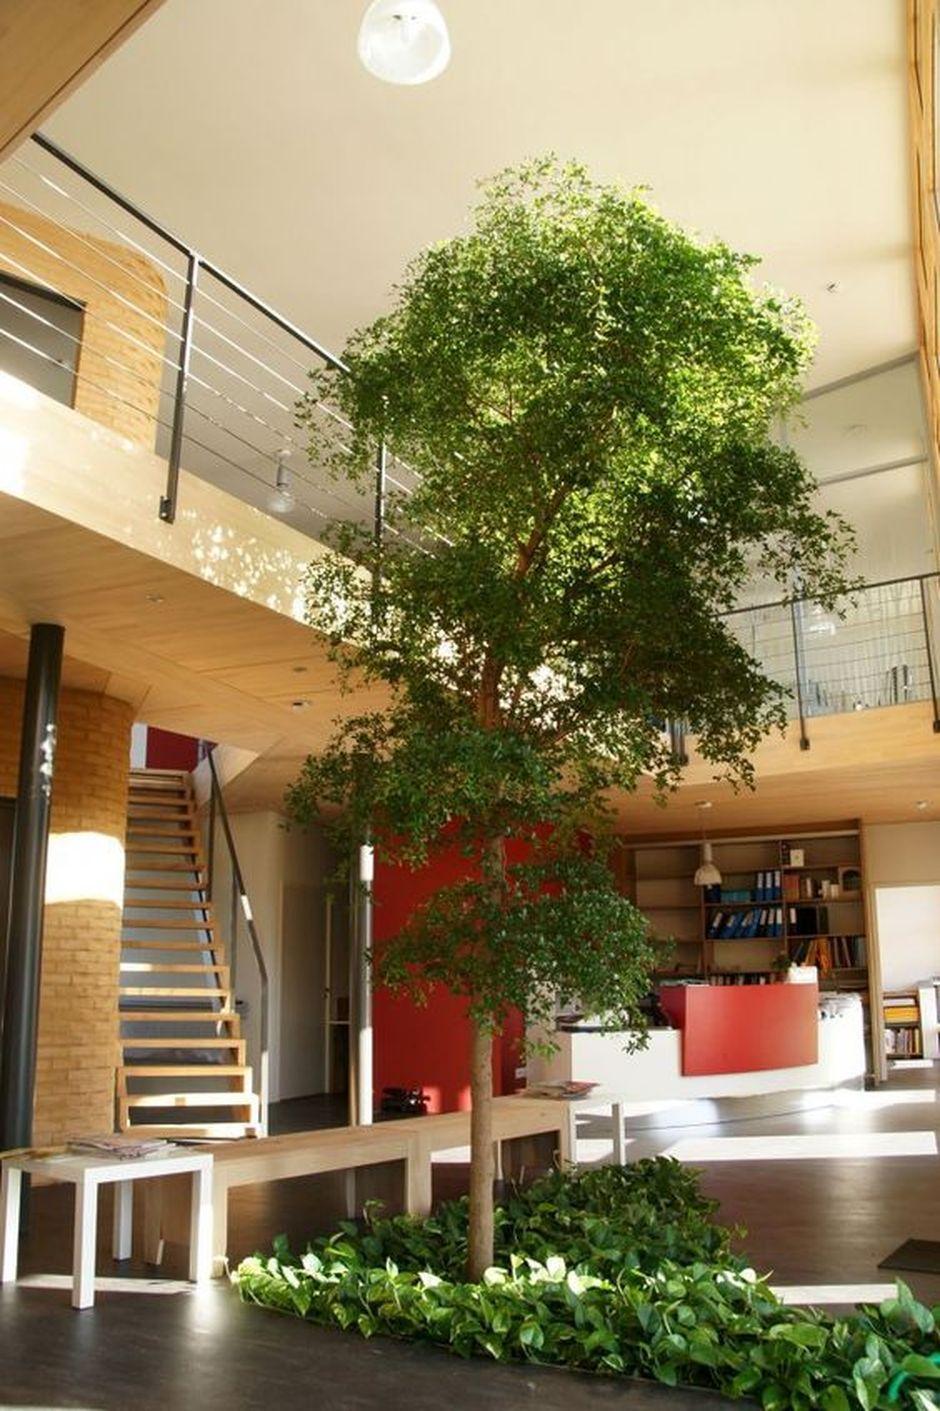 Amazing Artistic Tree Inside House Interior Designs Tree